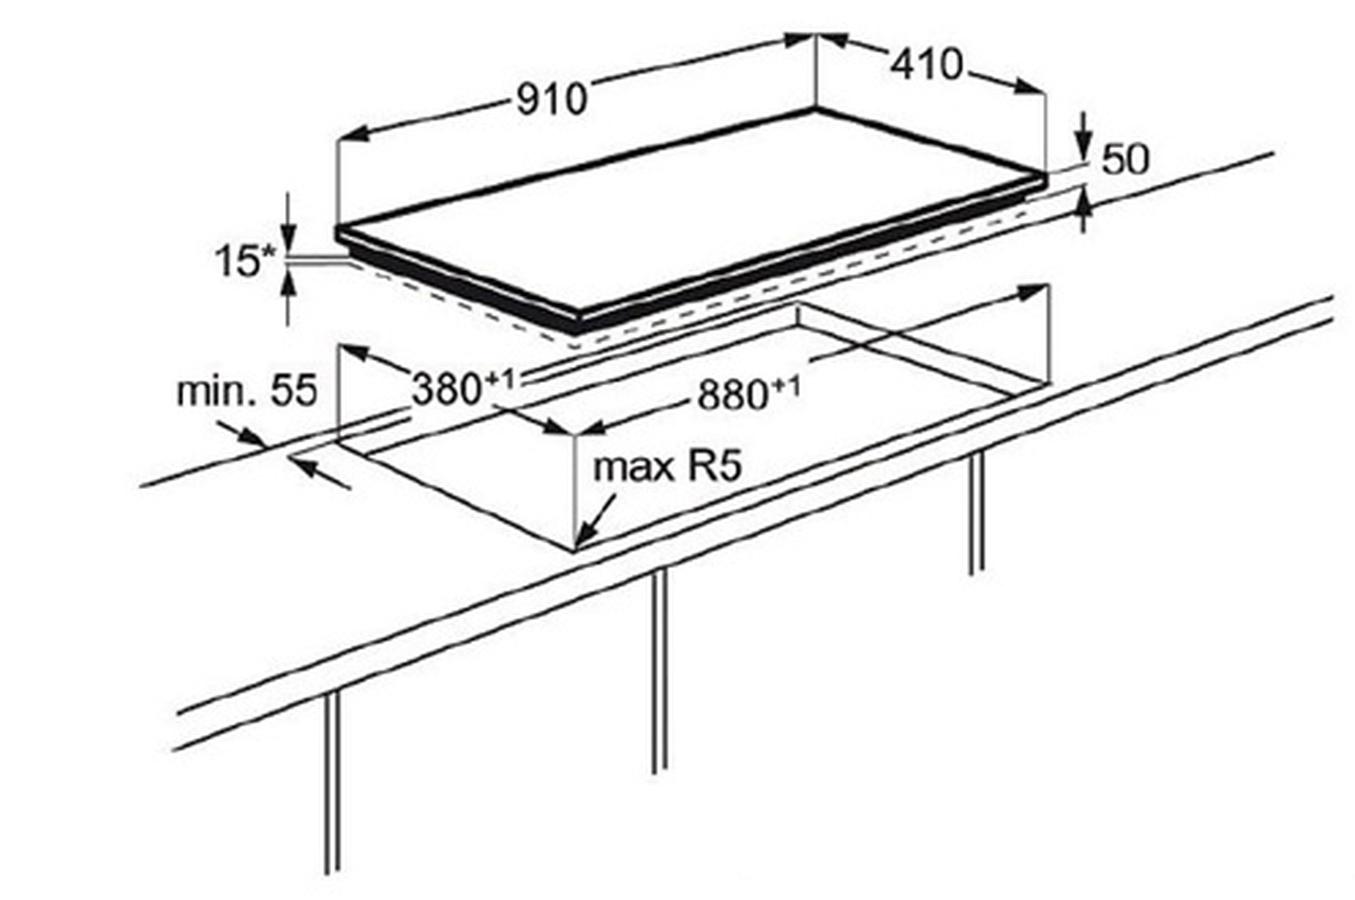 plaque electrolux ehl9530fok pas cher. Black Bedroom Furniture Sets. Home Design Ideas